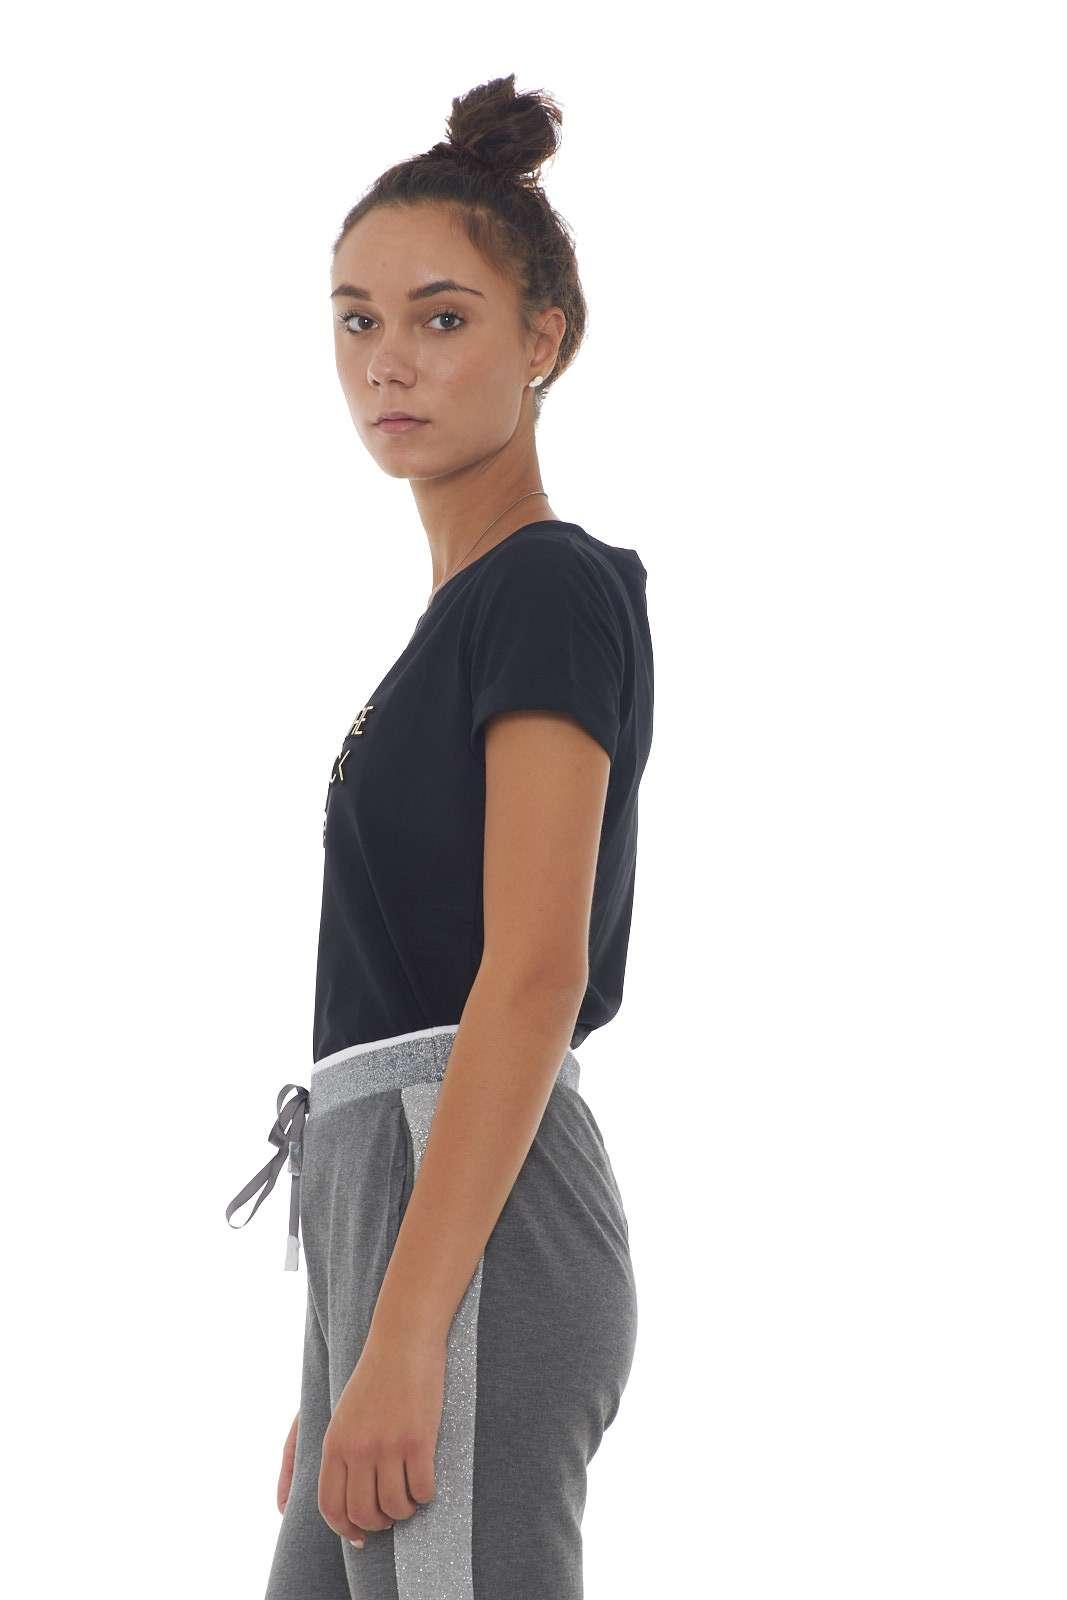 https://www.parmax.com/media/catalog/product/a/i/AI-outlet_parmax-t-shirt-donna-Liu-Jo-T69041%20J0088-B.jpg